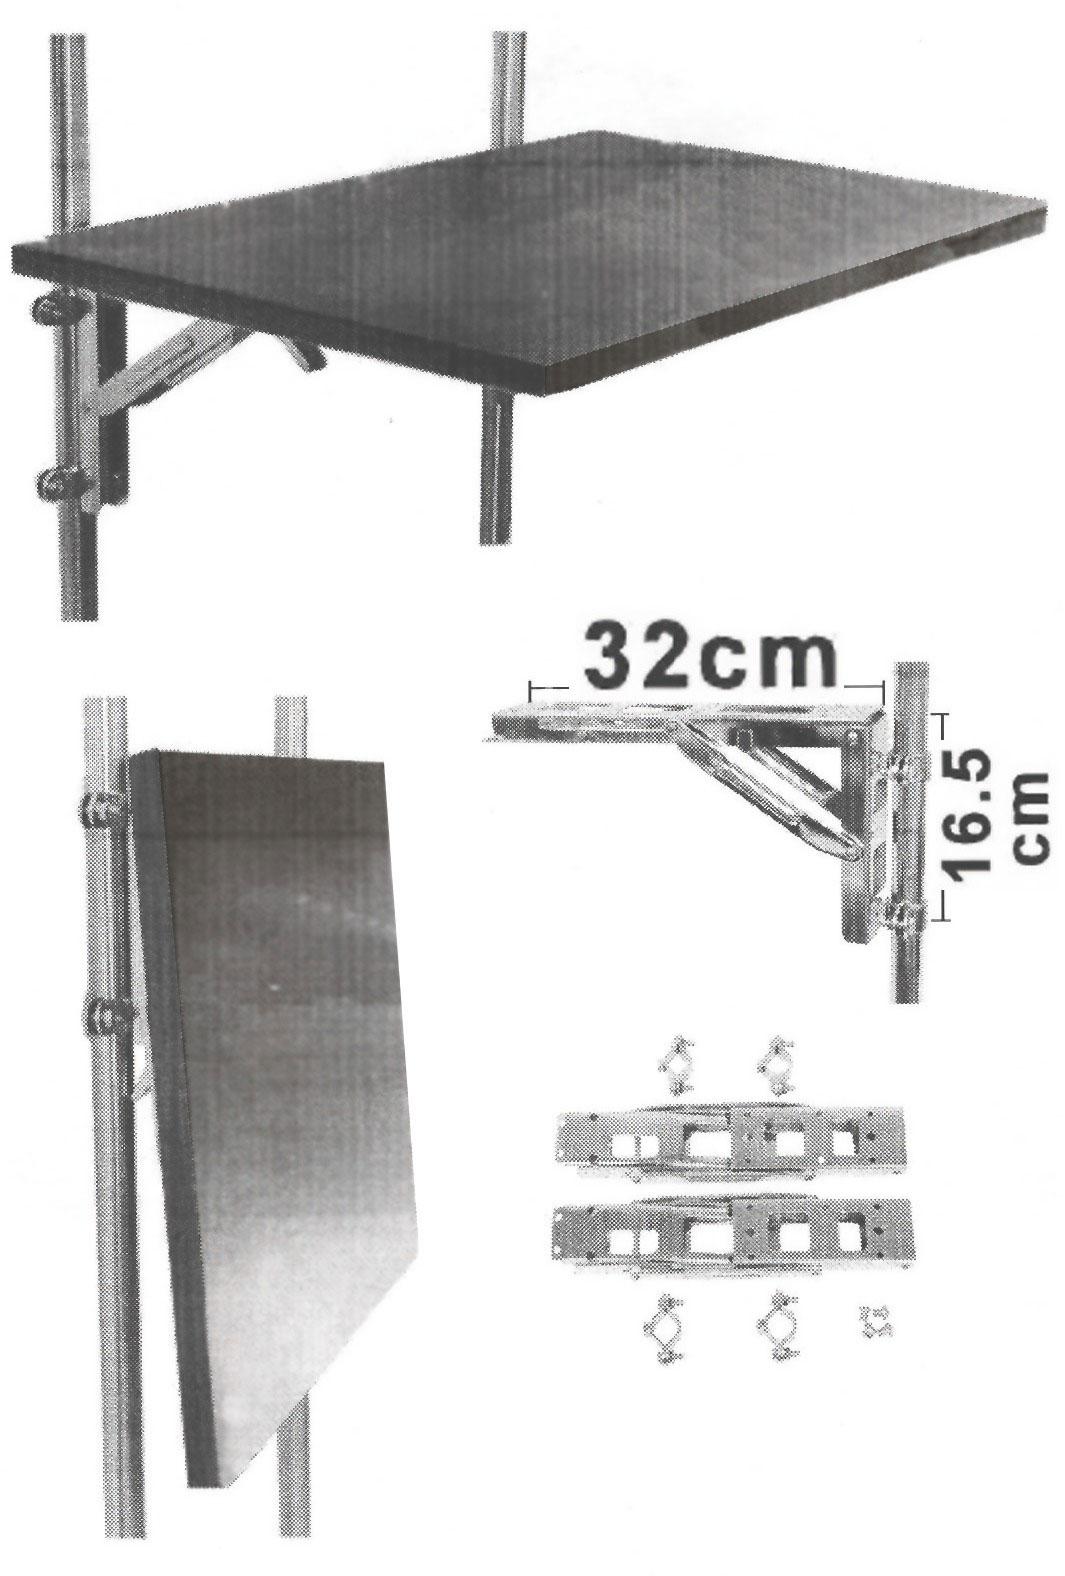 Soporte plegable acero inoxidable para asientos o mesas for Mesa plegable con asientos